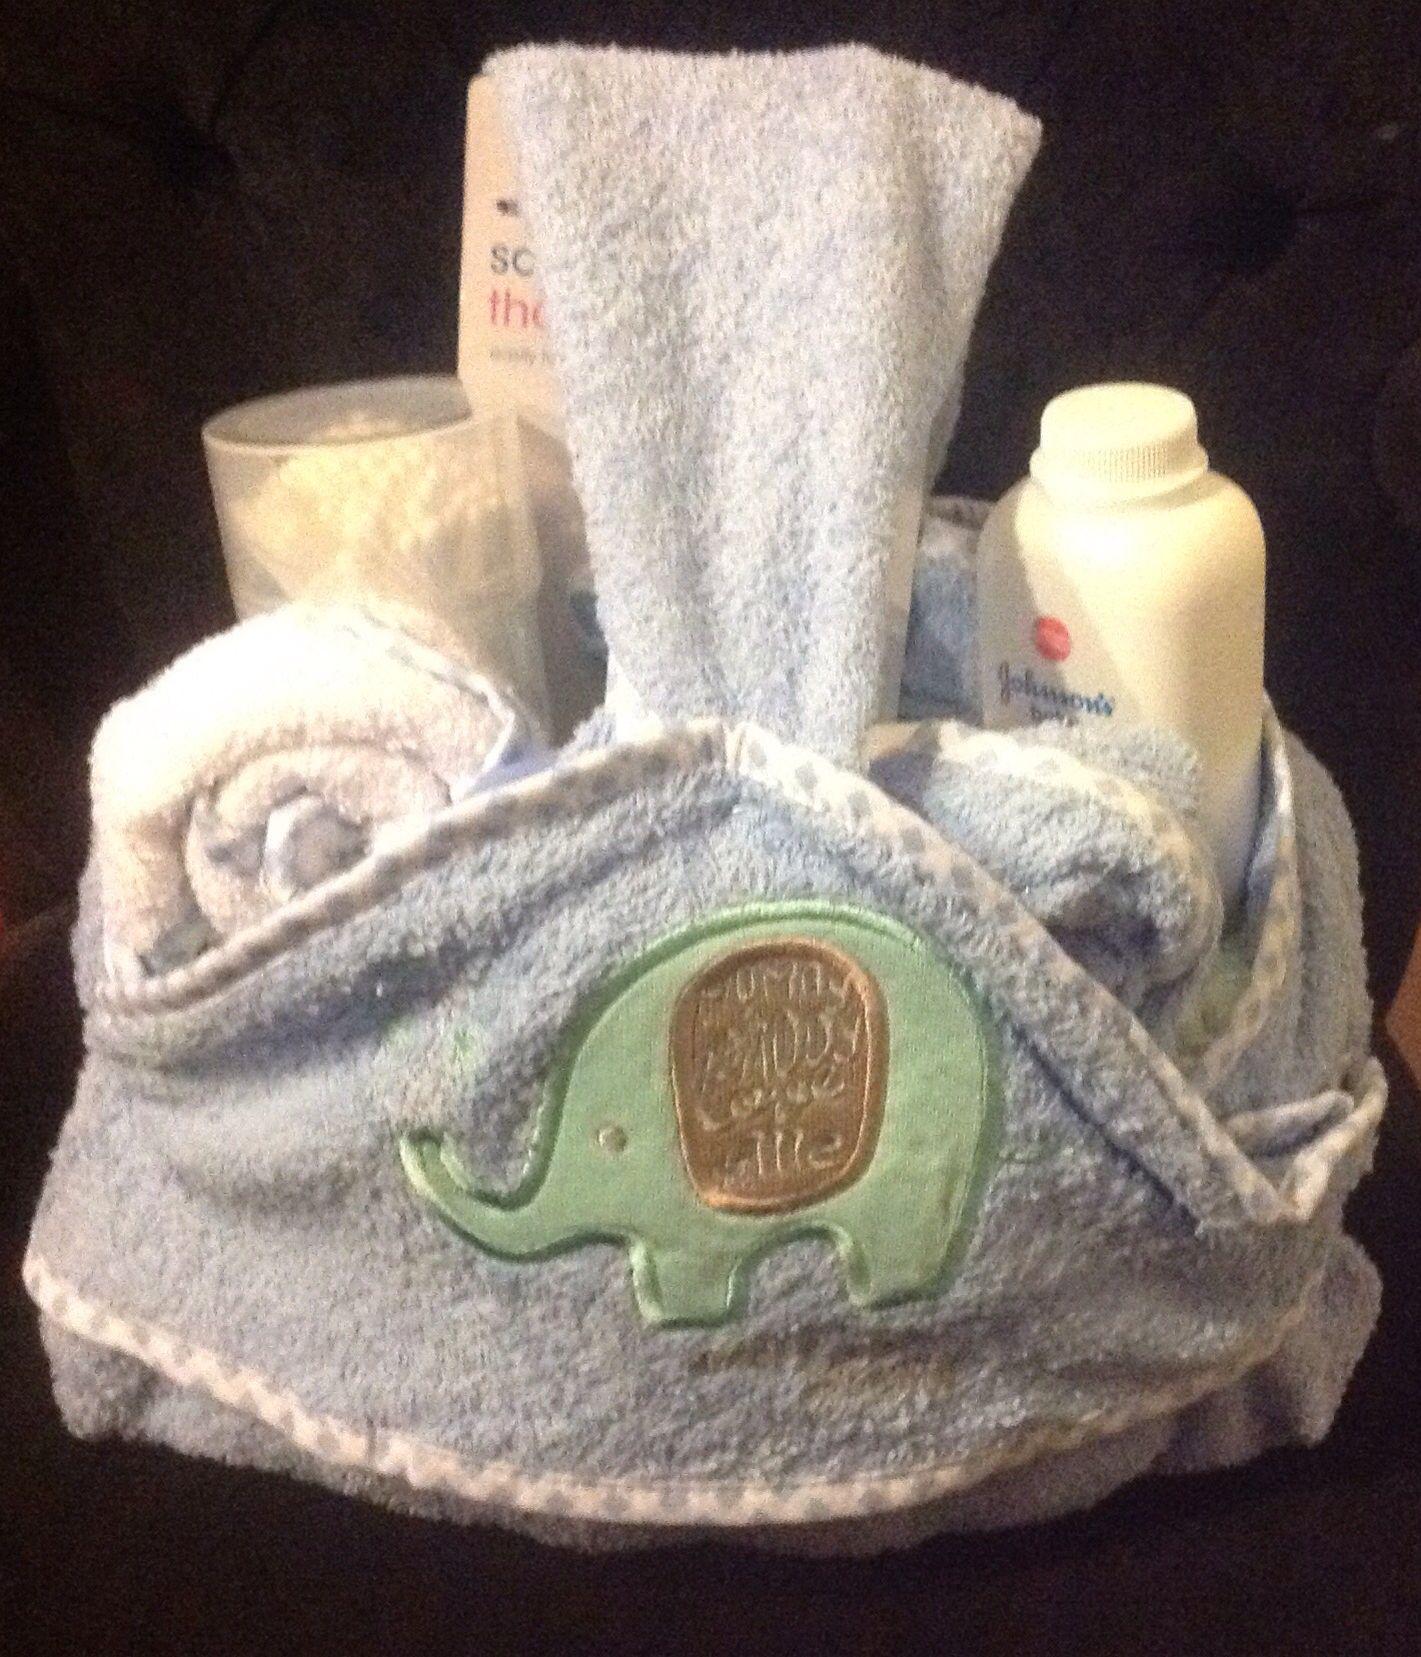 Bath time nappy cake ...made to order info@chocdelite.co.za